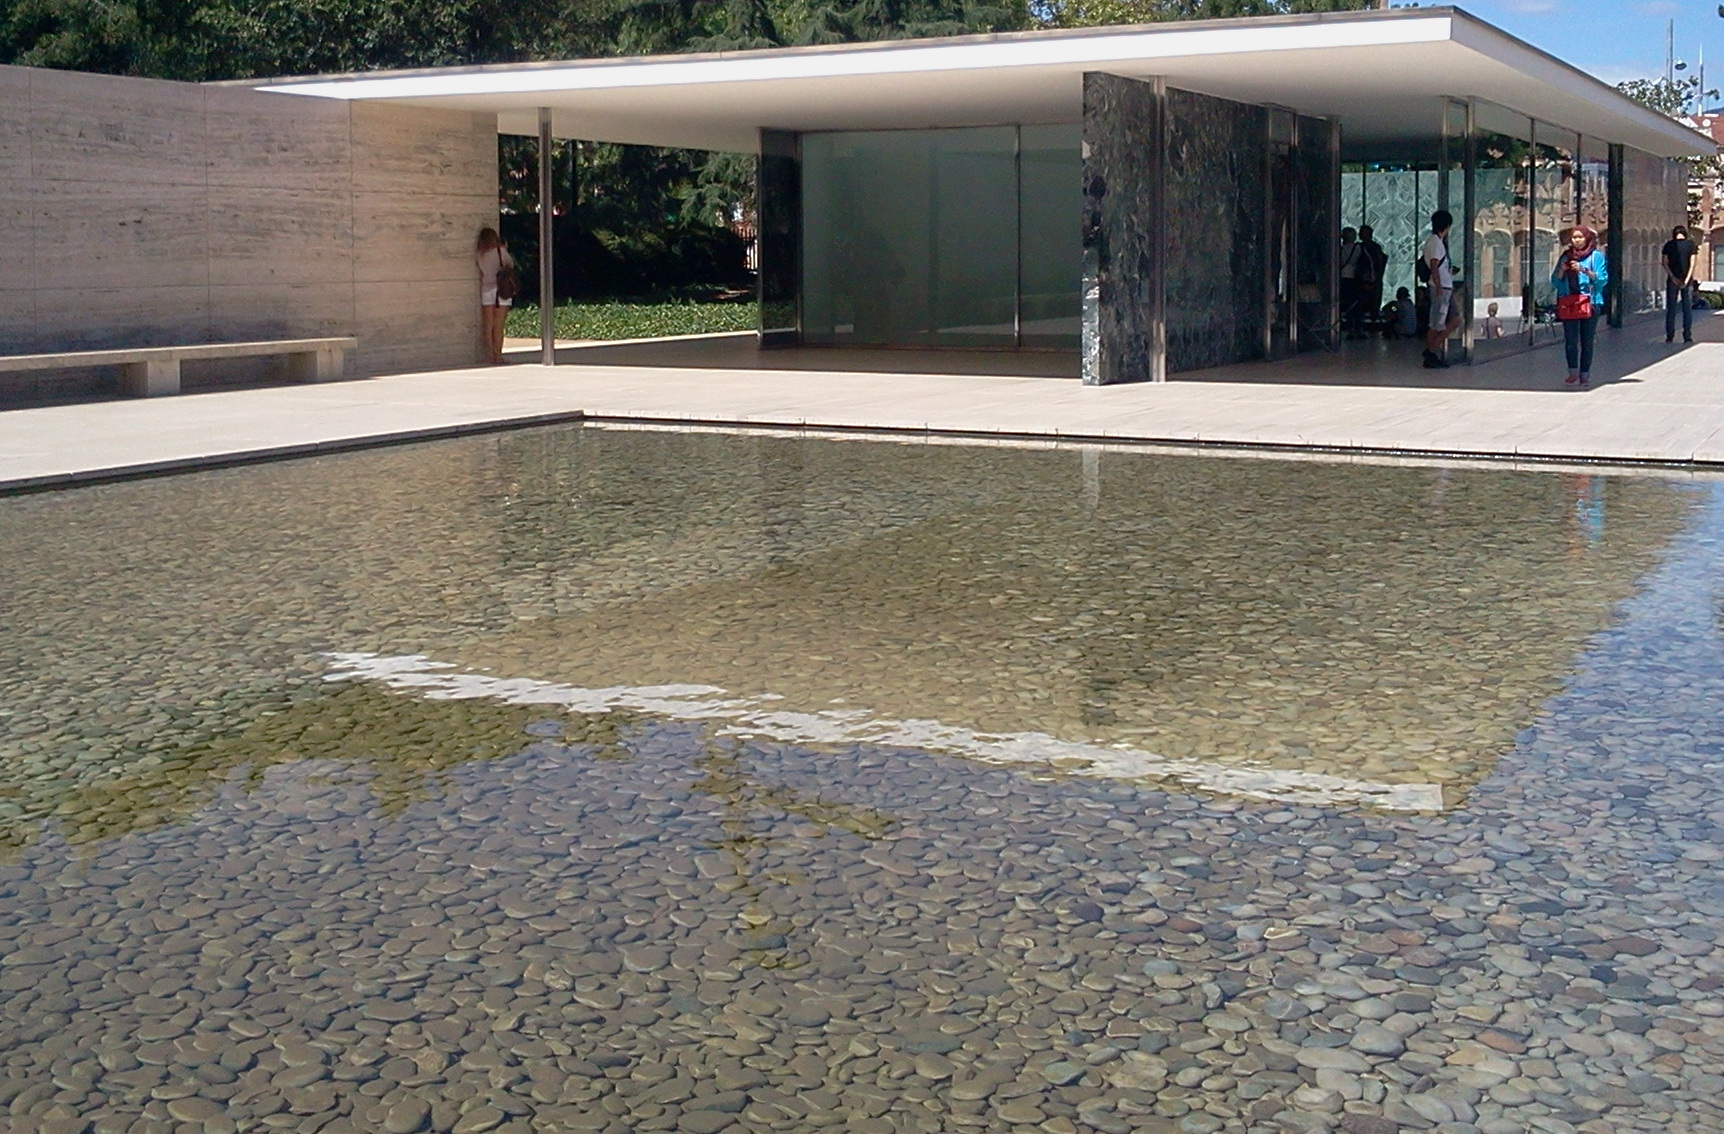 Pavelló Mies van der Rohe (Barcelona Pavillion) #9